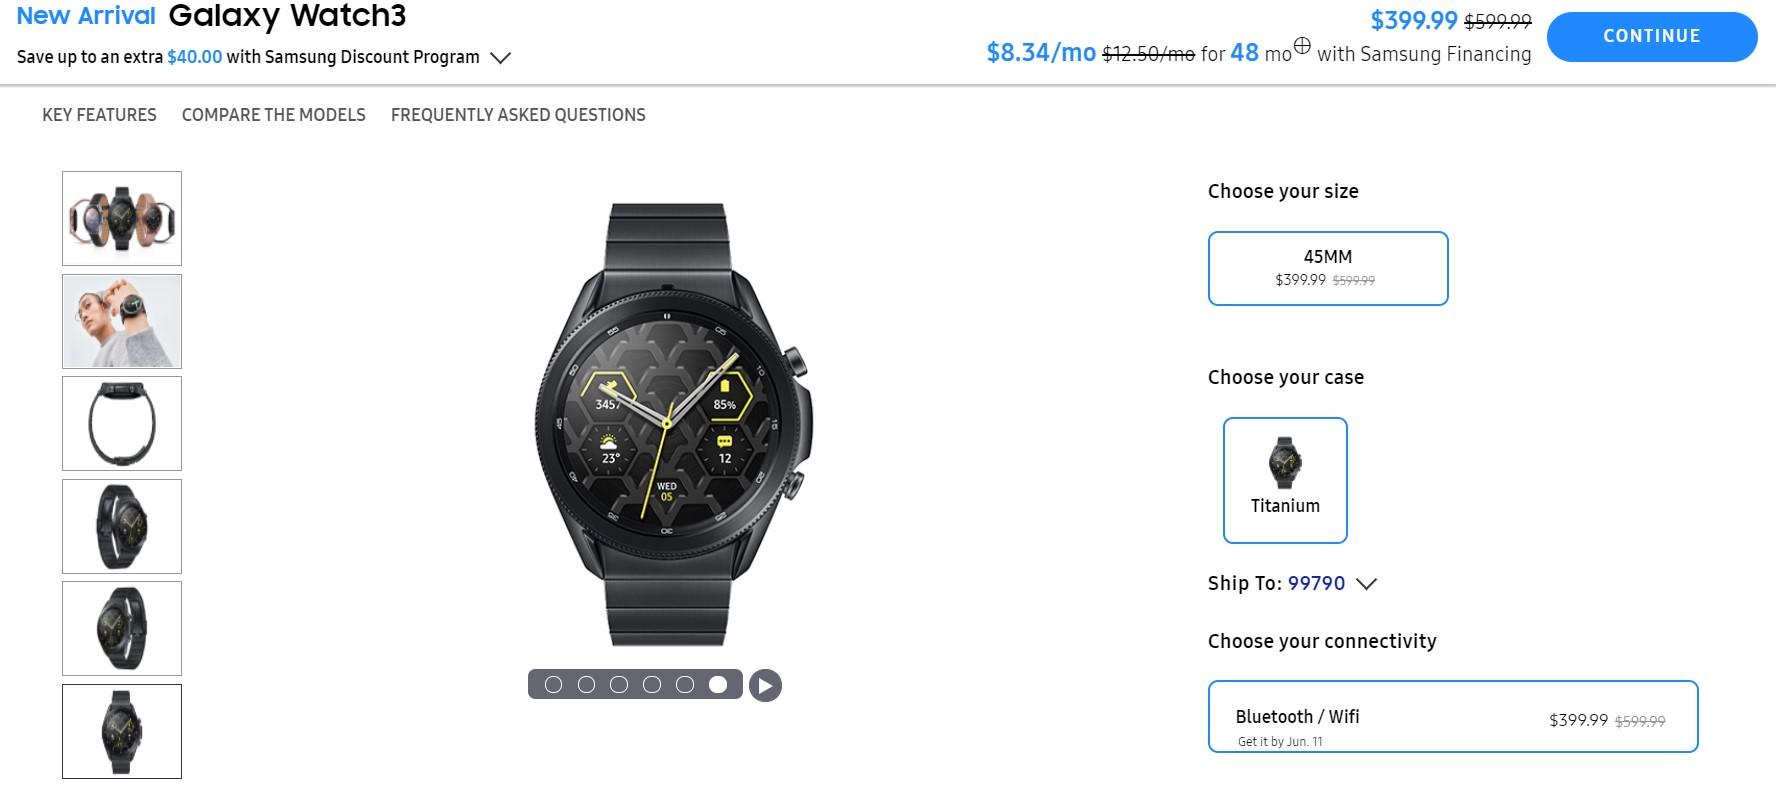 Samsung Galaxy Watch 3 Titanium 45mm Bluetooth Deal